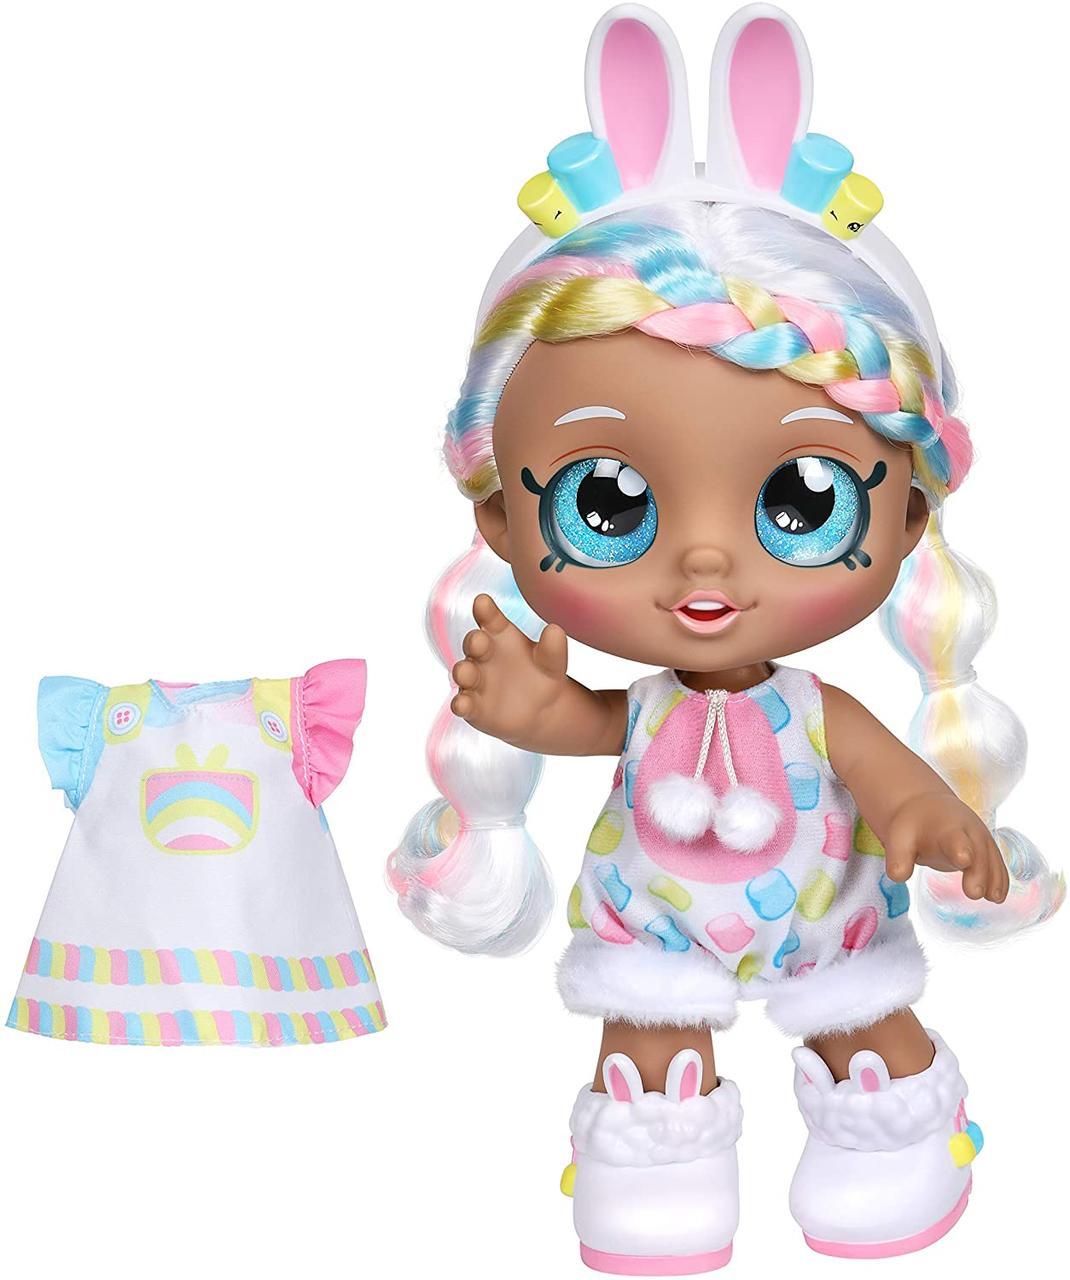 Кинди Кидс Марша Меллоу Наряжай друга Зайка Kindi Kids Dress Up Friends Pre-School Marsha Mello Bunny 50064